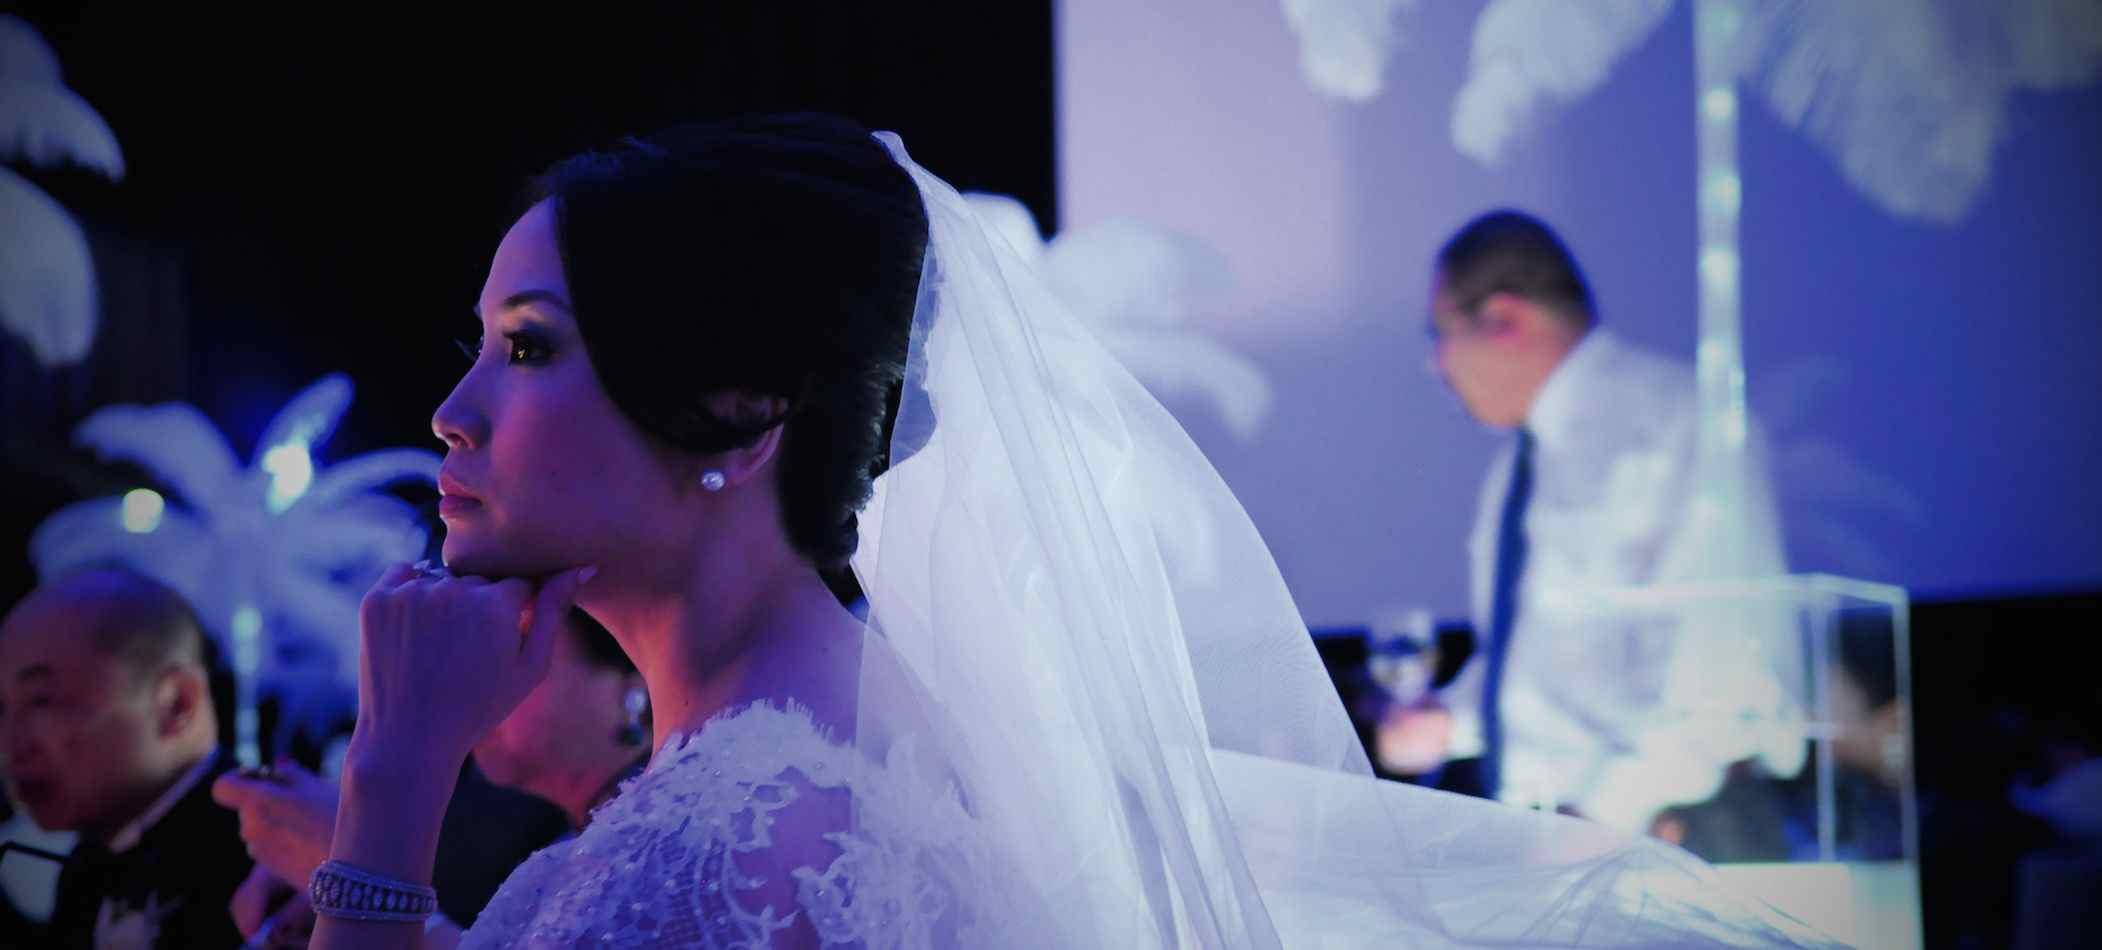 Kalamakeup bridal image – Faye 10